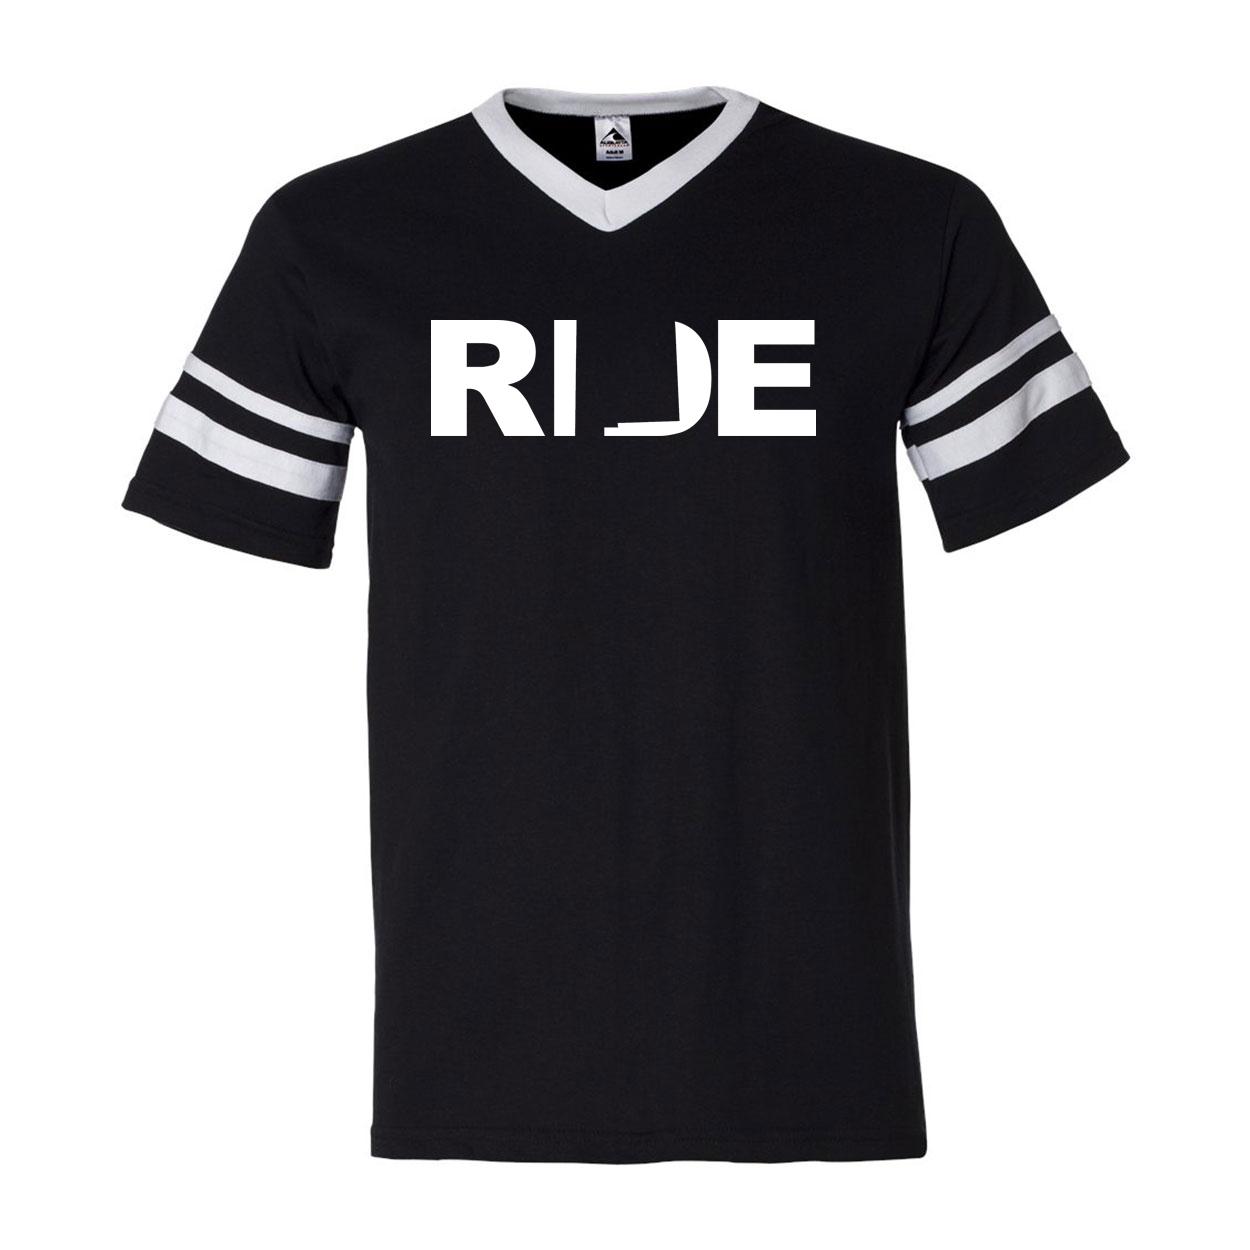 Ride New Mexico Classic Premium Striped Jersey T-Shirt Black/White (White Logo)